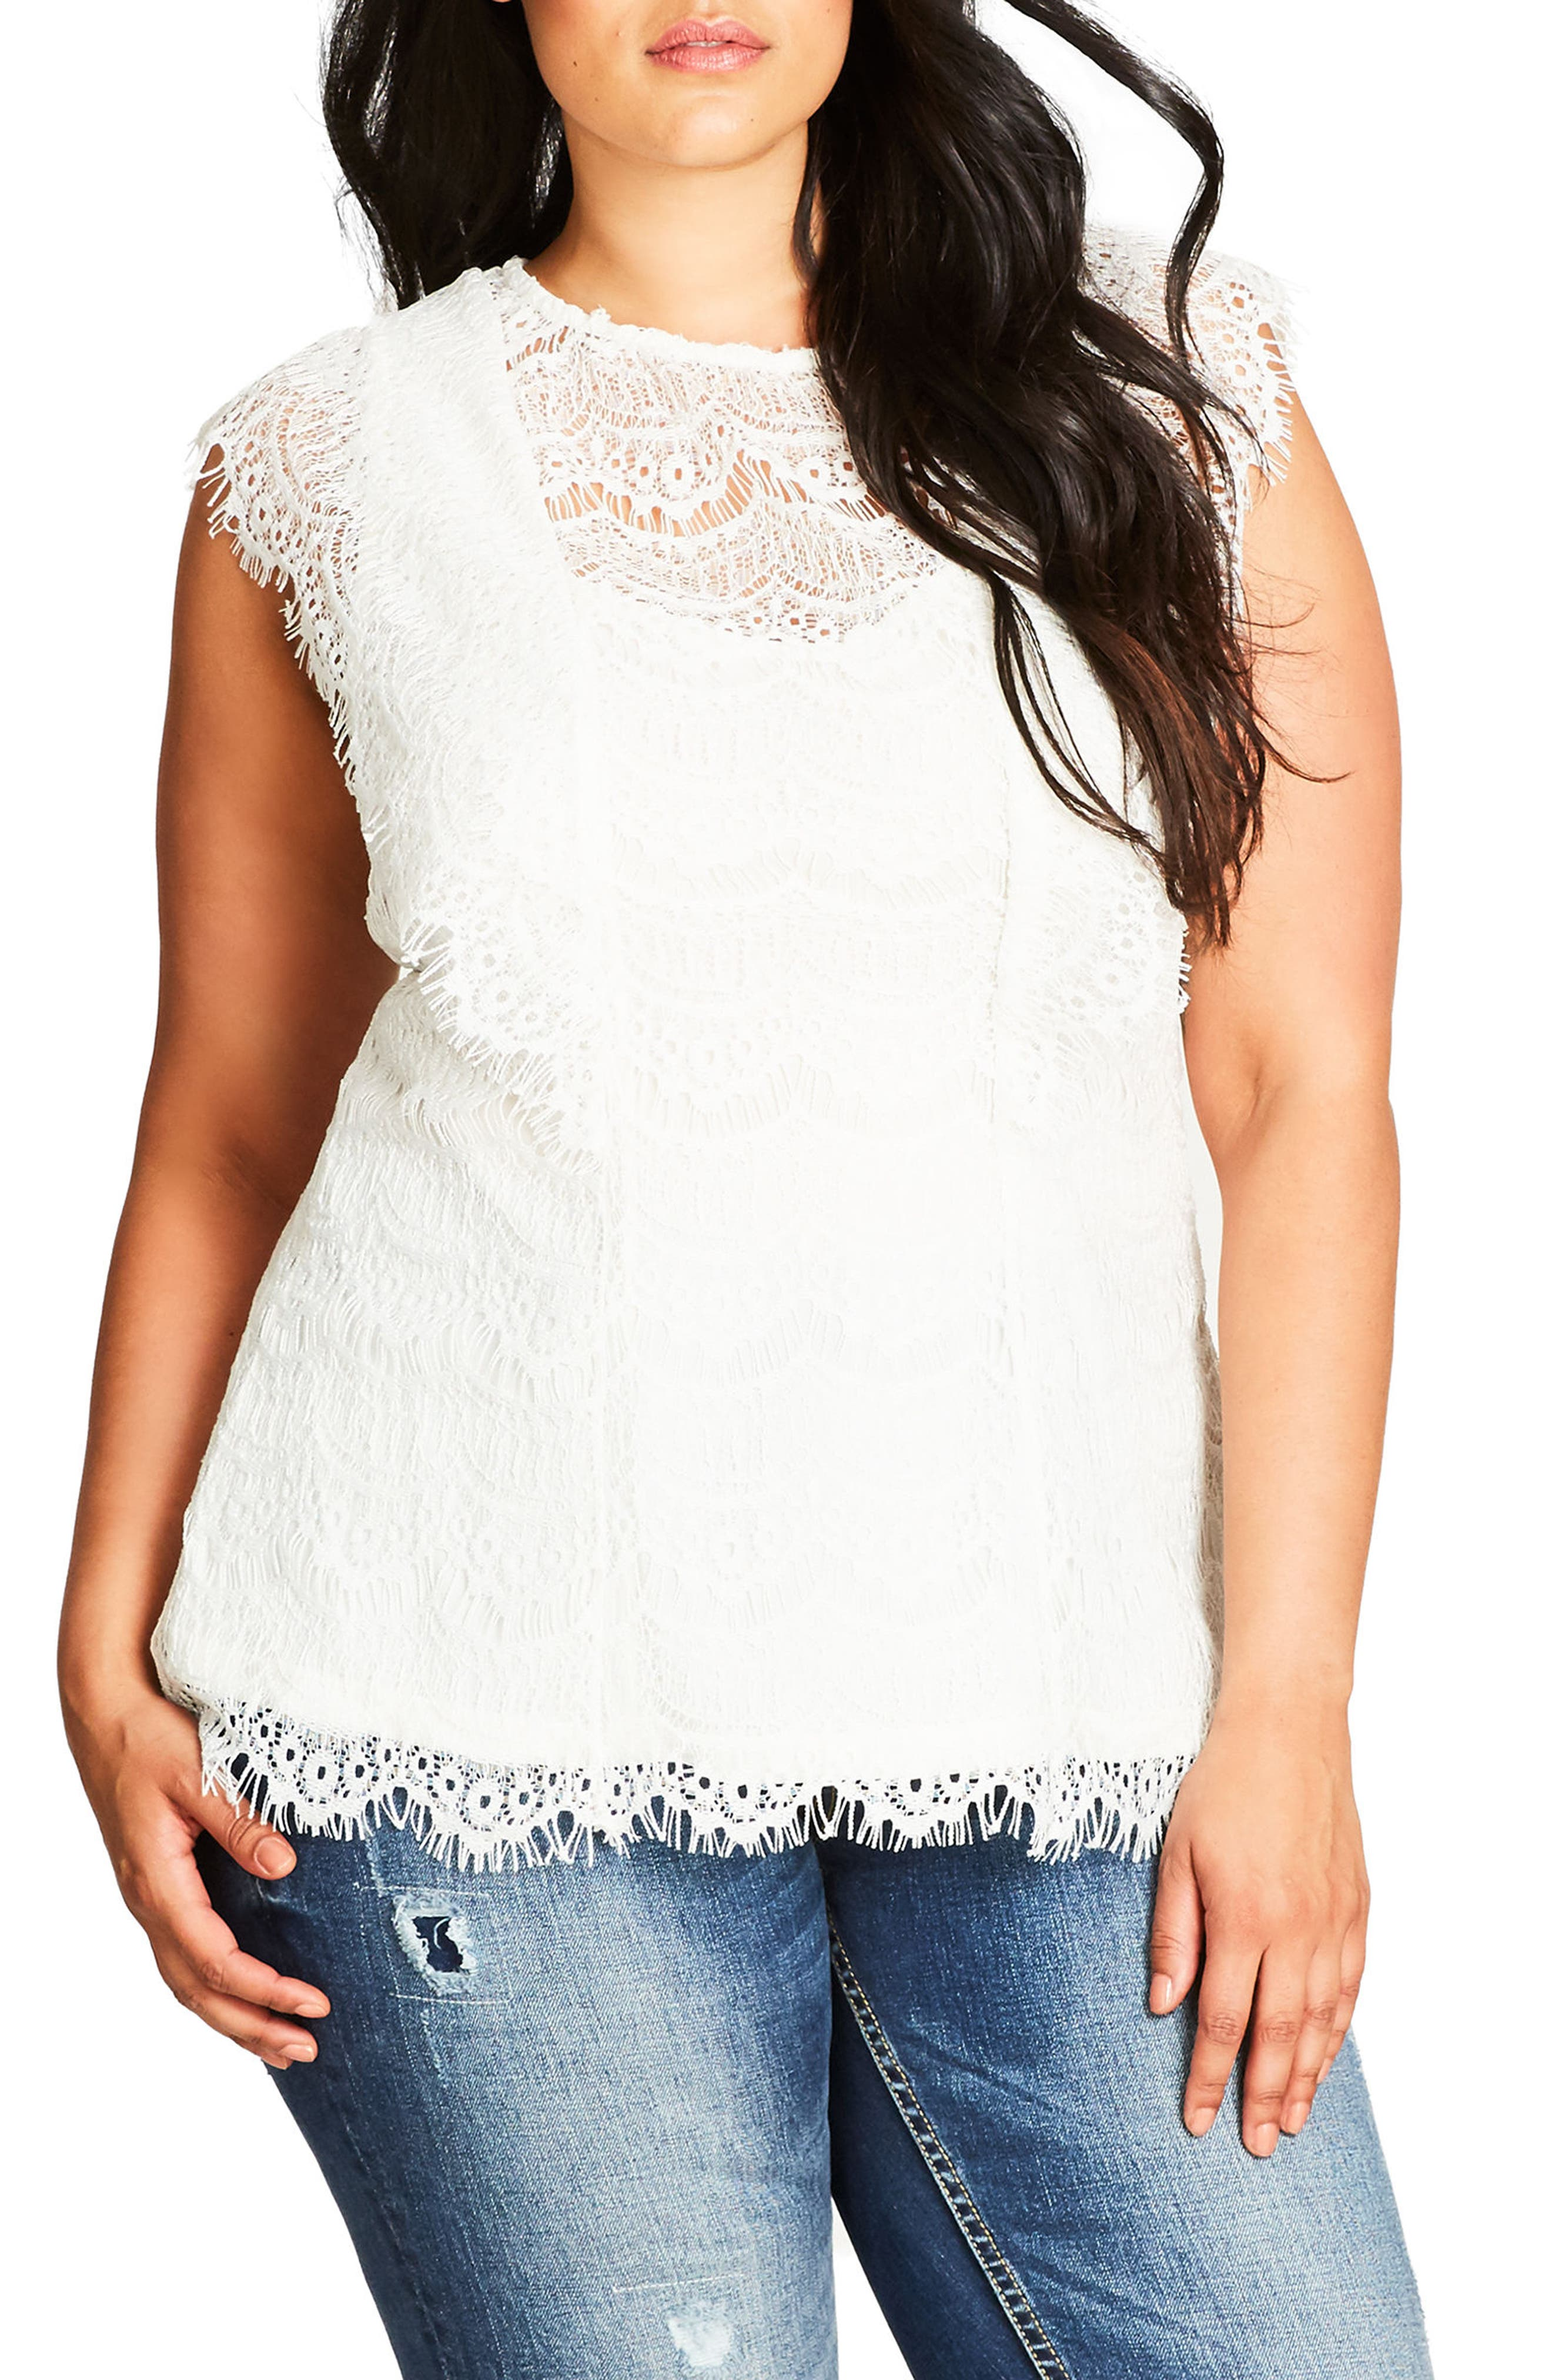 Alternate Image 1 Selected - City Chic Cotton Blend Lace Top (Plus Size)